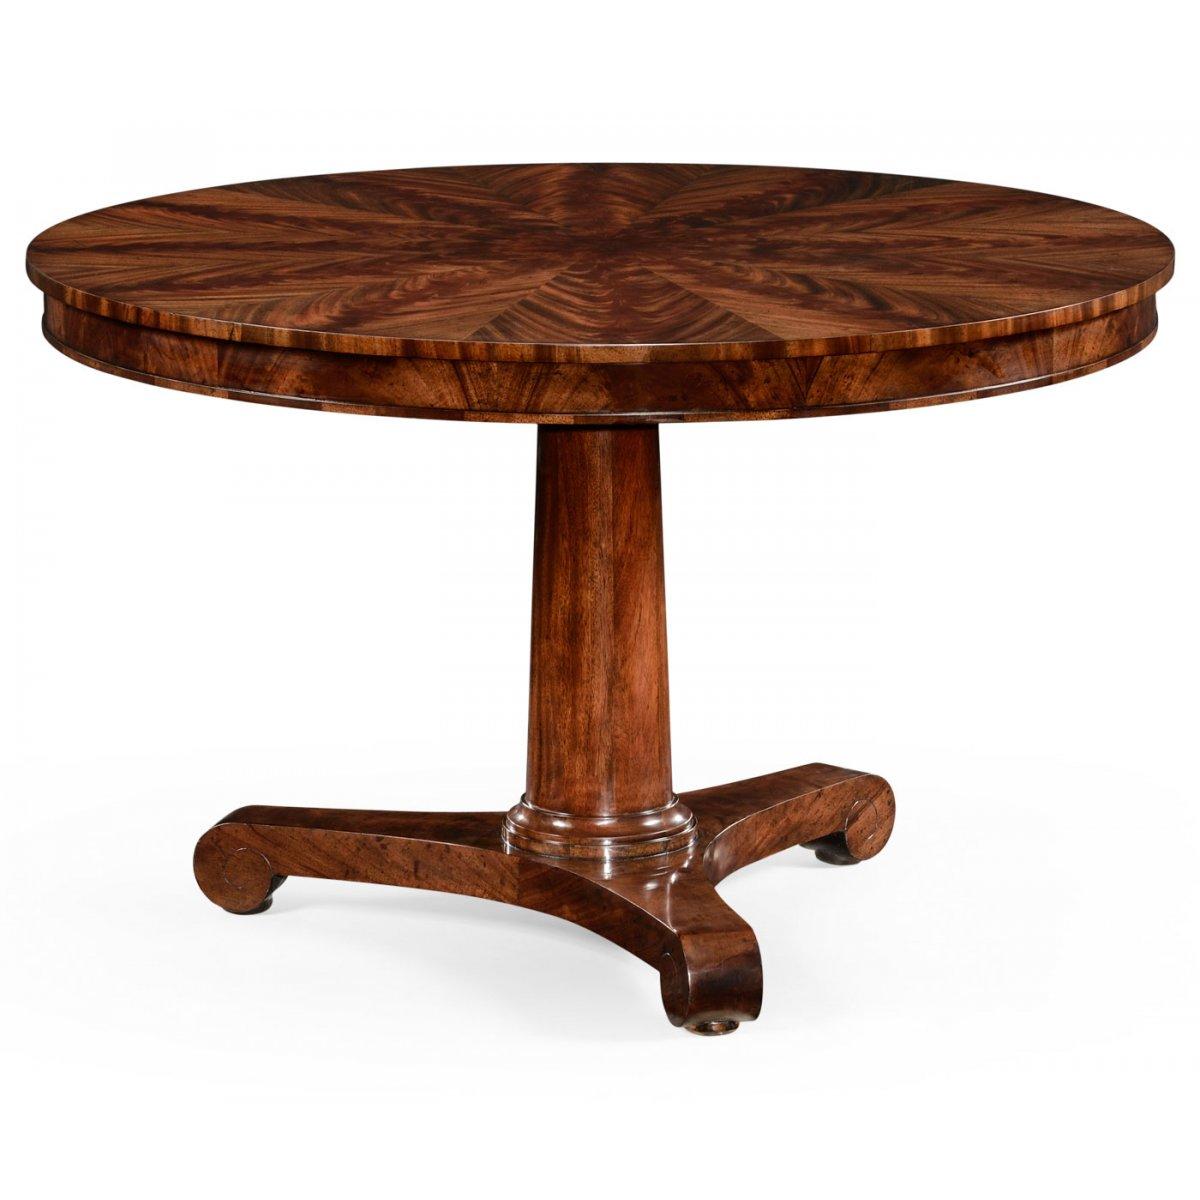 6 Seater Pedestal Mahogany Dining Table Swanky Interiors